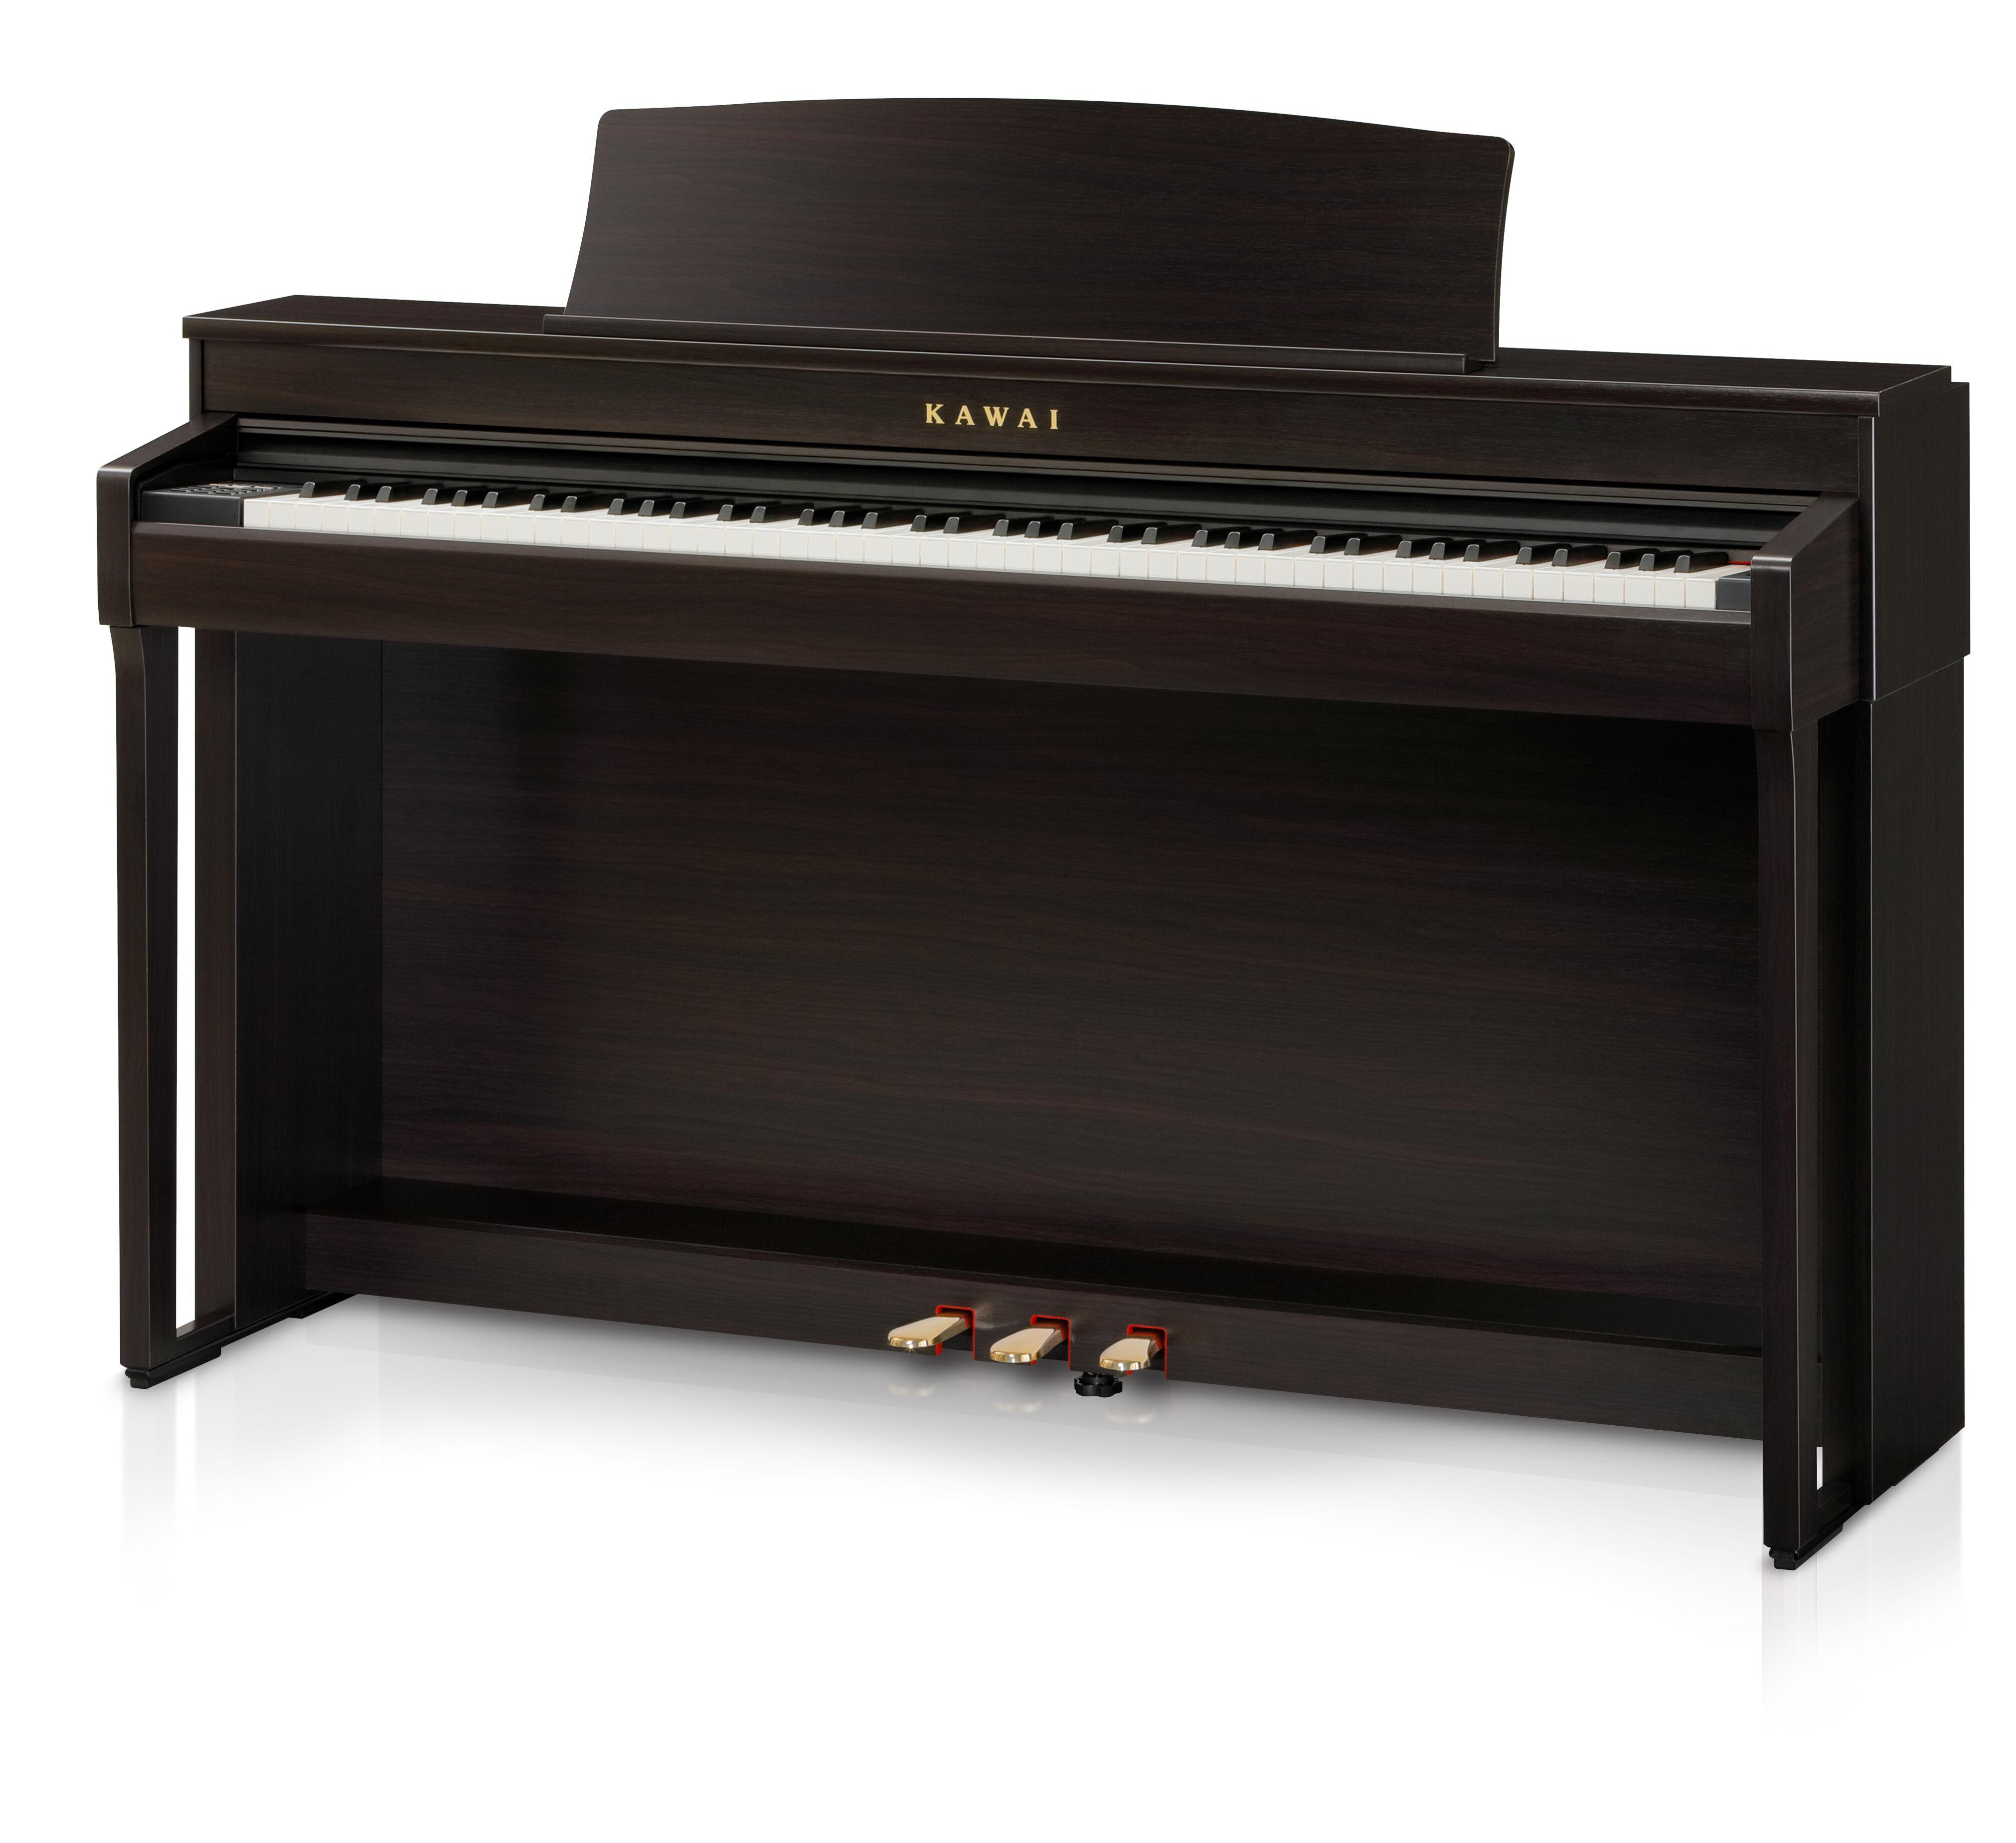 Kawai Cn-39 Rosentræ Digital Piano